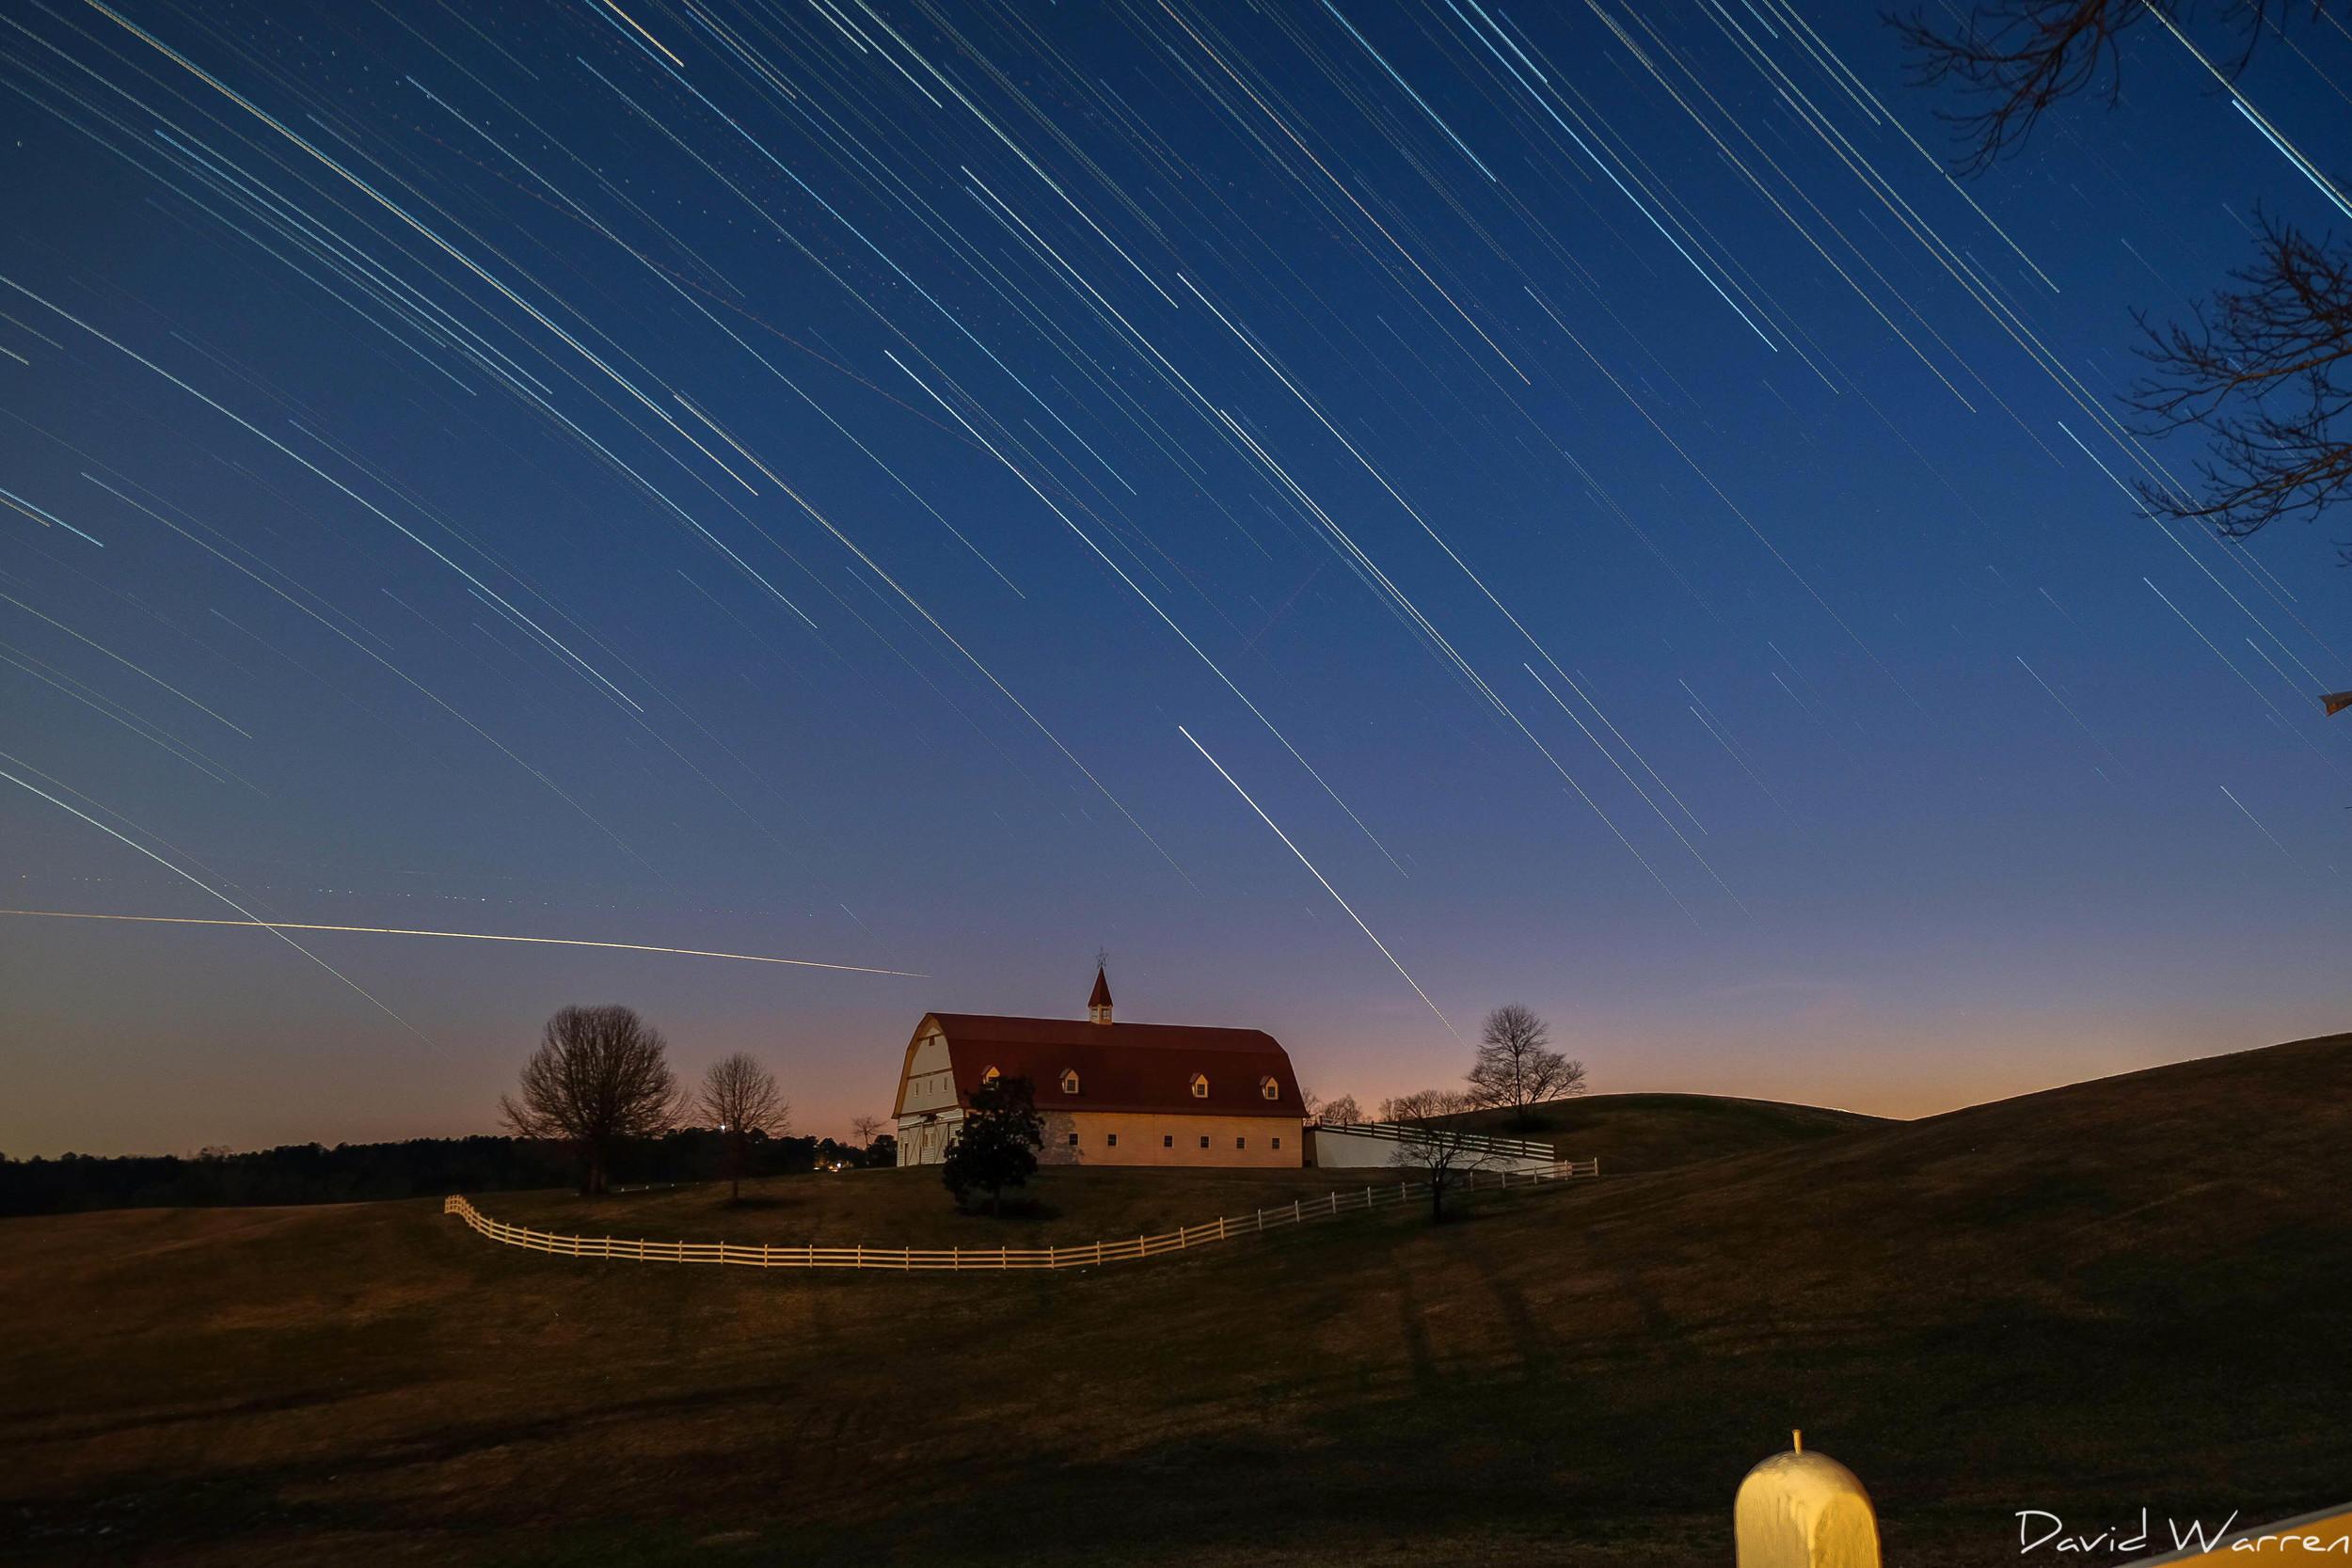 Star Trails over The Hallmark Farm in Warrior